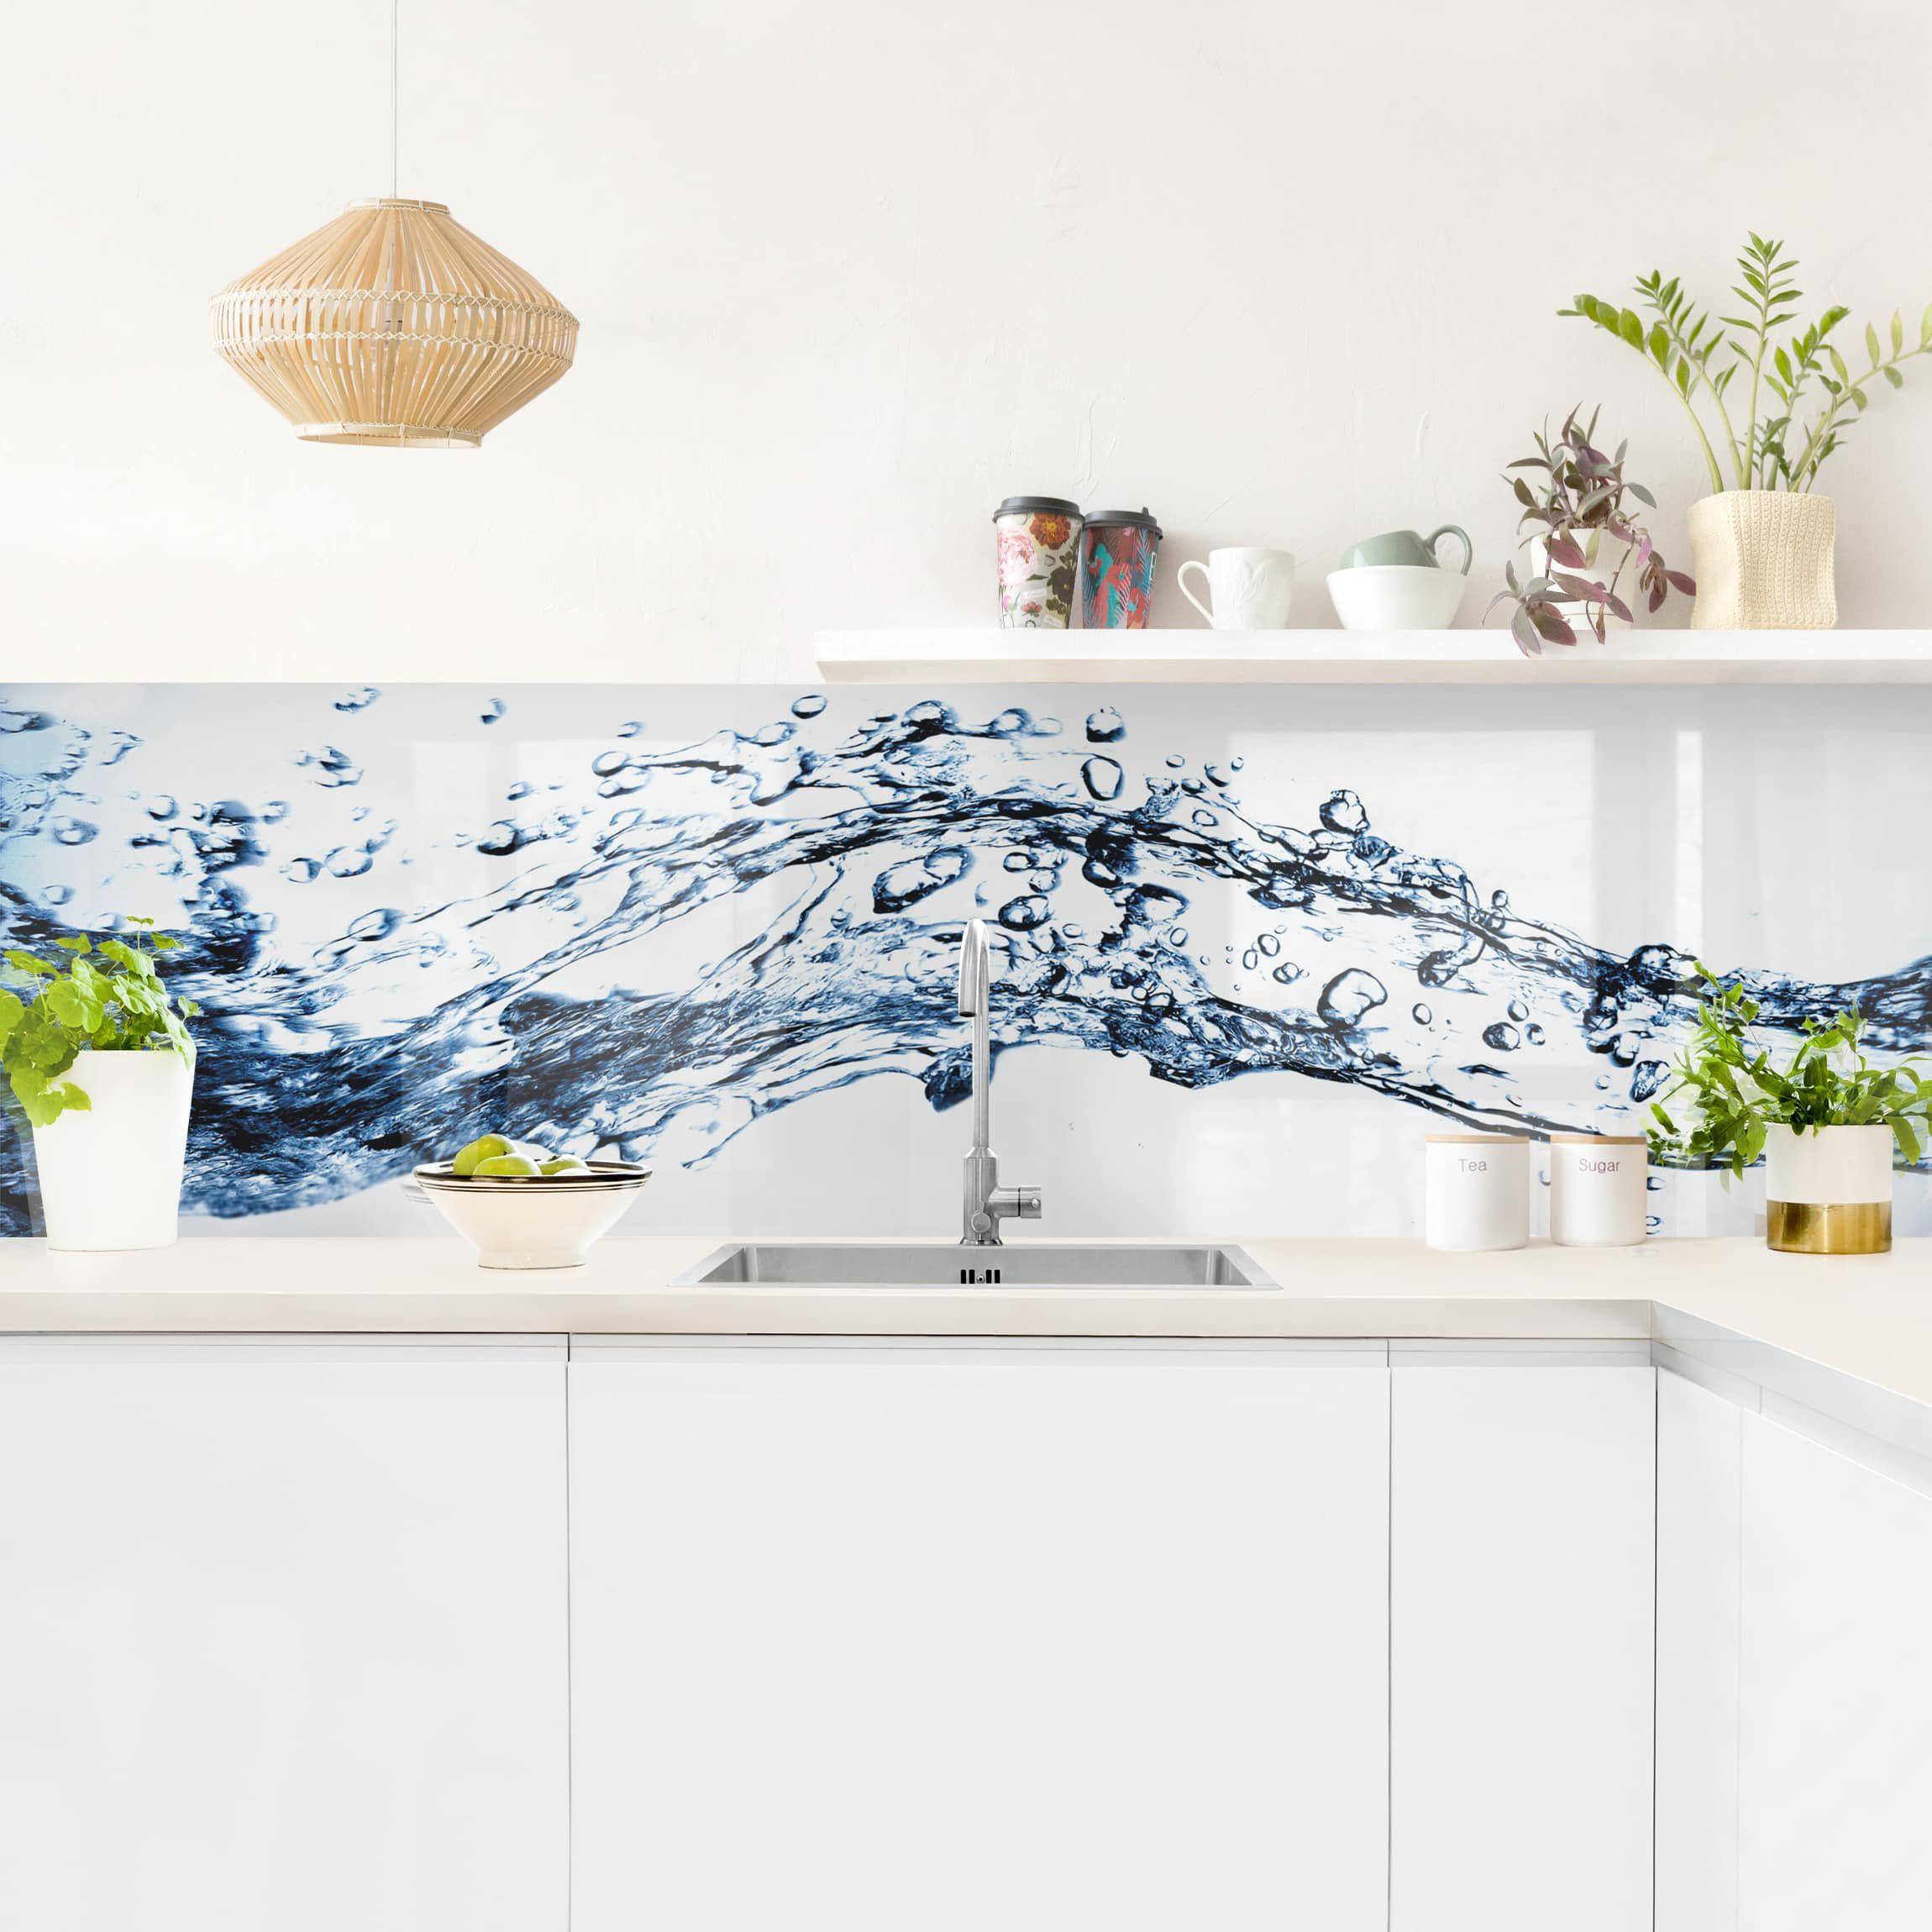 Kuchenruckwand Water Splash In 2020 Kuchenruckwand Haus Deko